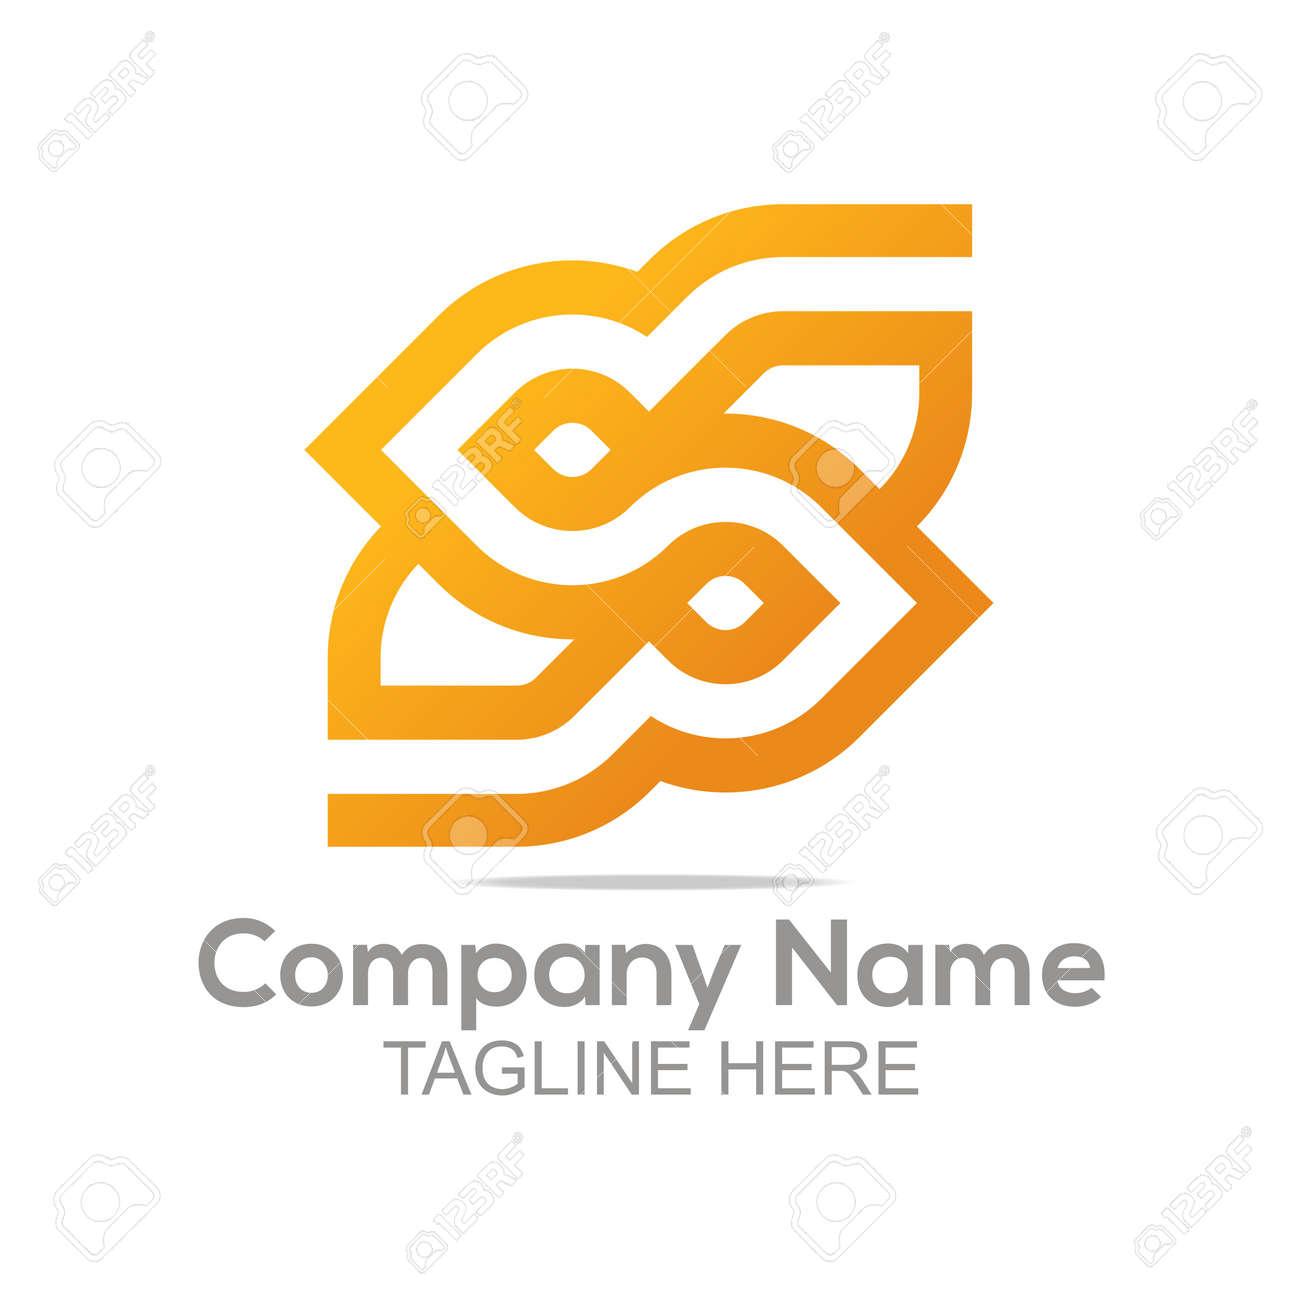 Logo design company name letter s infinity connecting symbol logo design company name letter s infinity connecting symbol icon abstract vector stock vector 45283497 buycottarizona